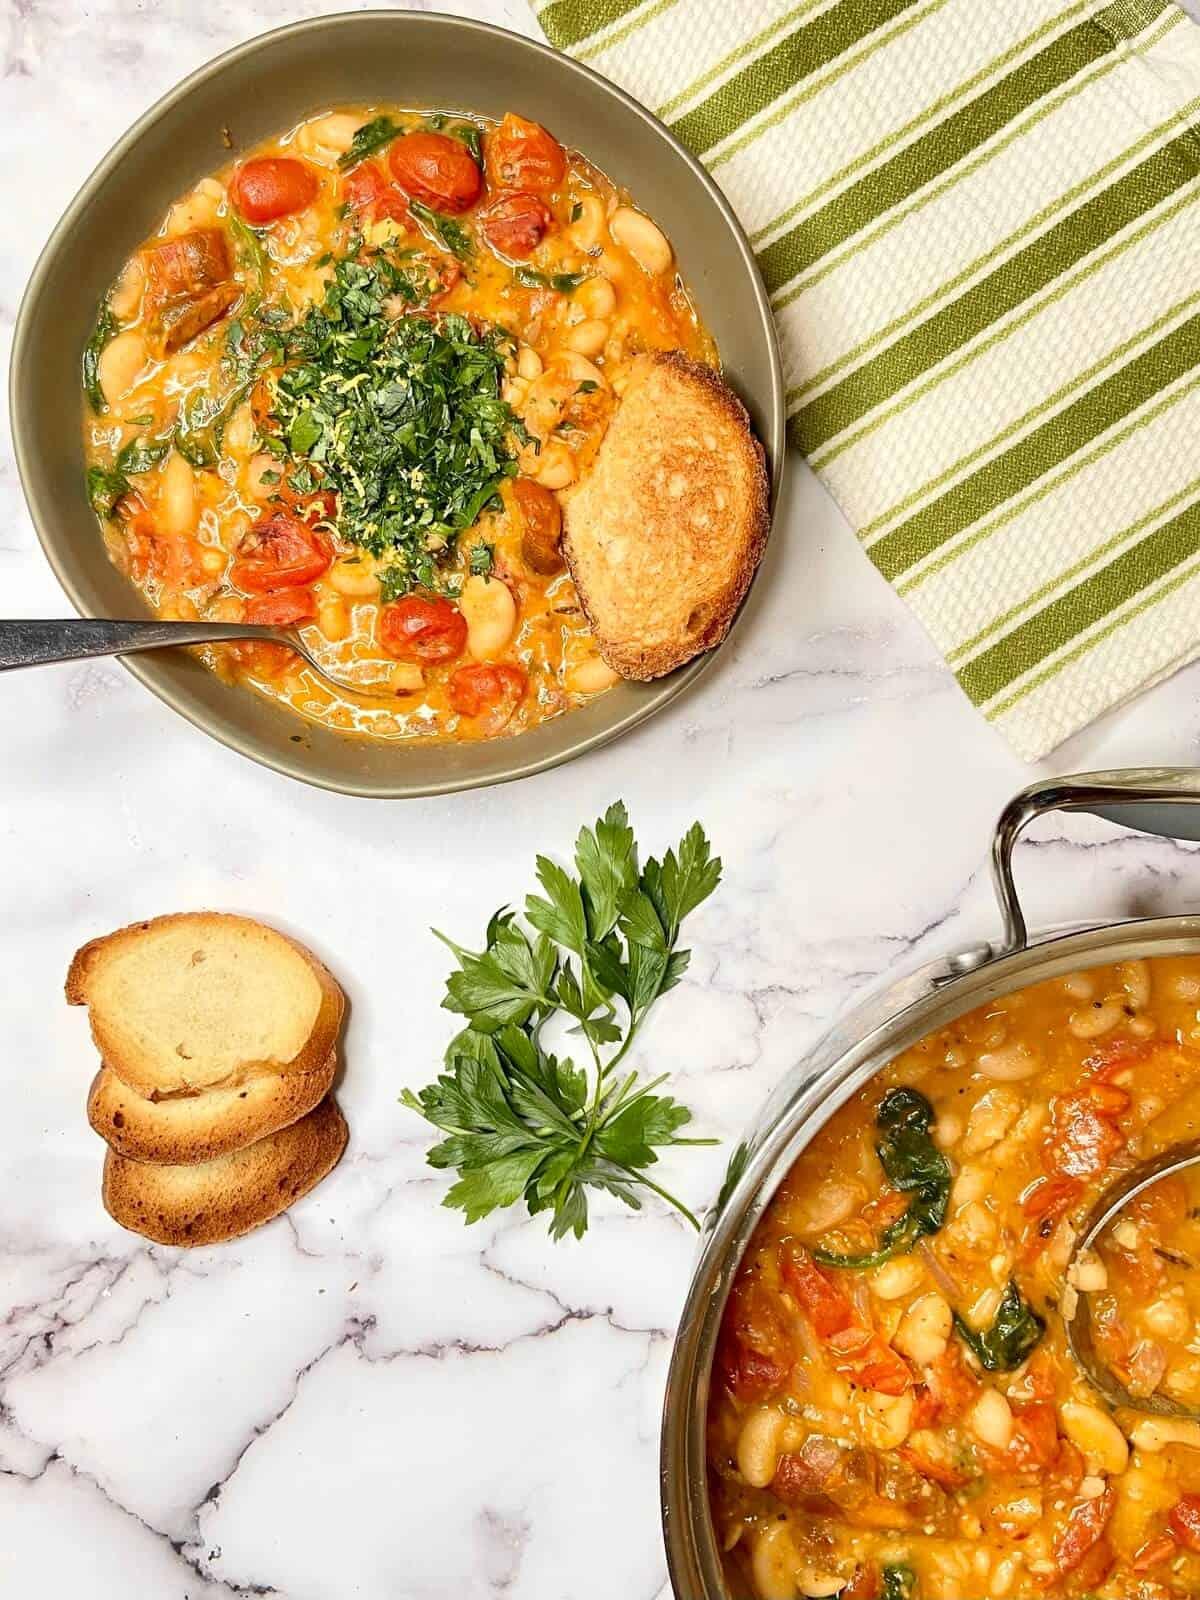 Roasted Tomato and White Bean Stew (Photo by Viana Boenzli)